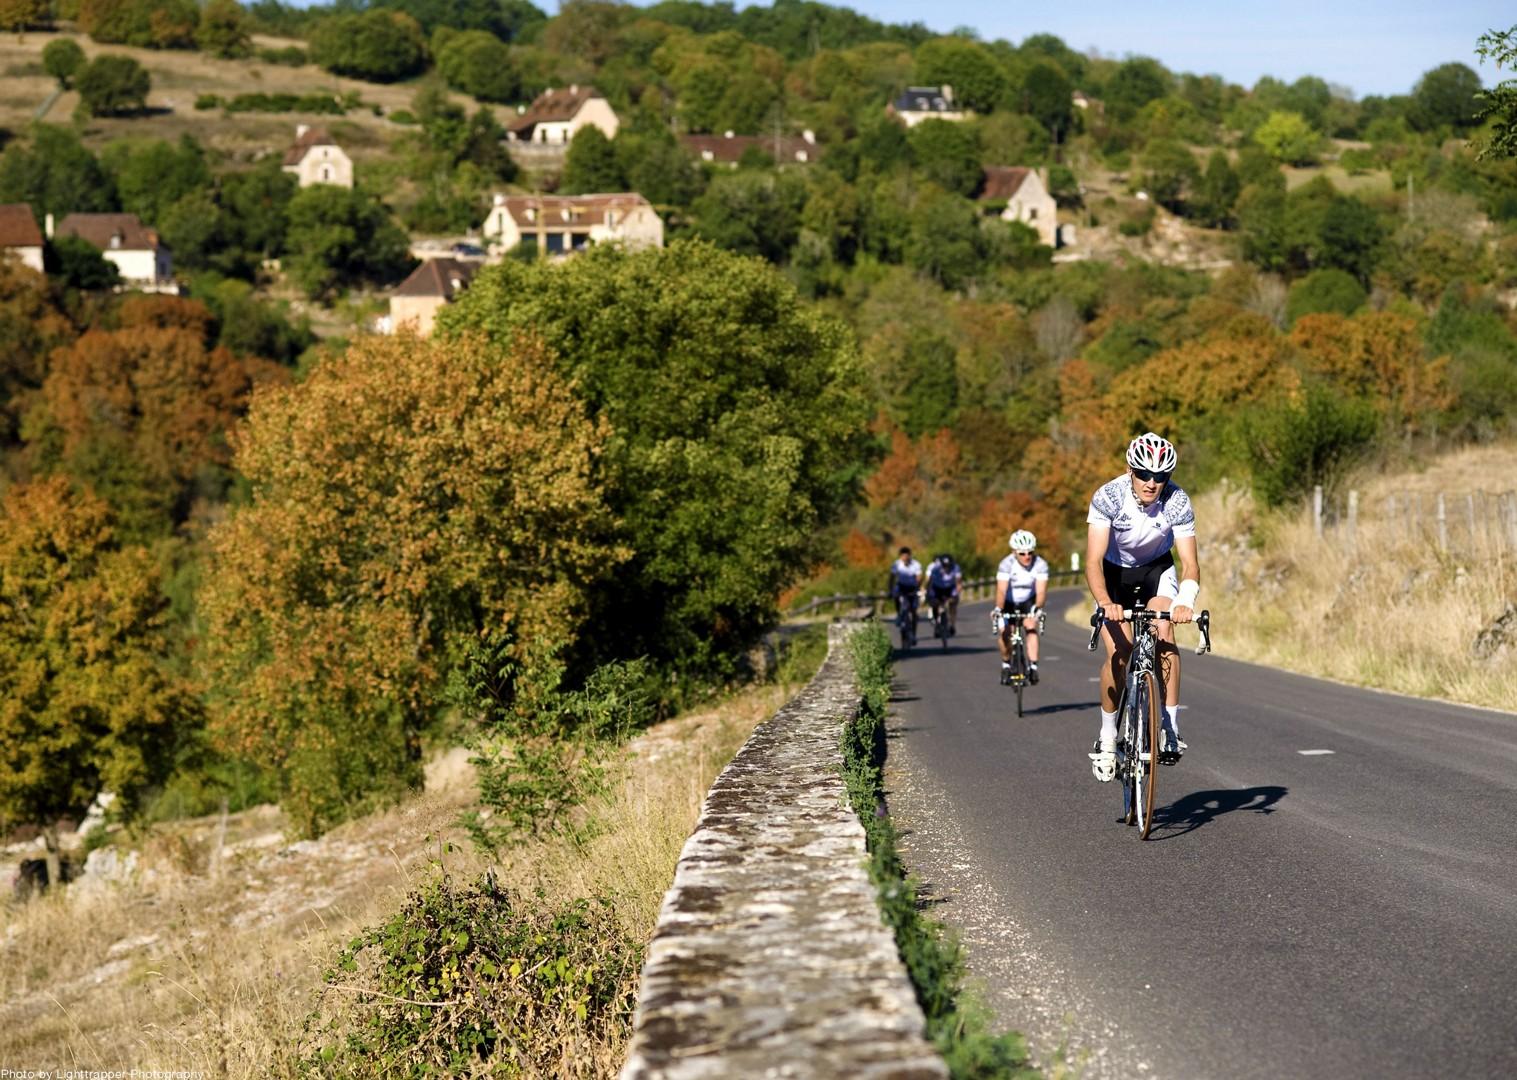 france-alsace-burgundy-beaujolais-road-holiday.jpg - France - Alsace, Burgundy and Beaujolais - Guided Road Cycling Holiday - Road Cycling